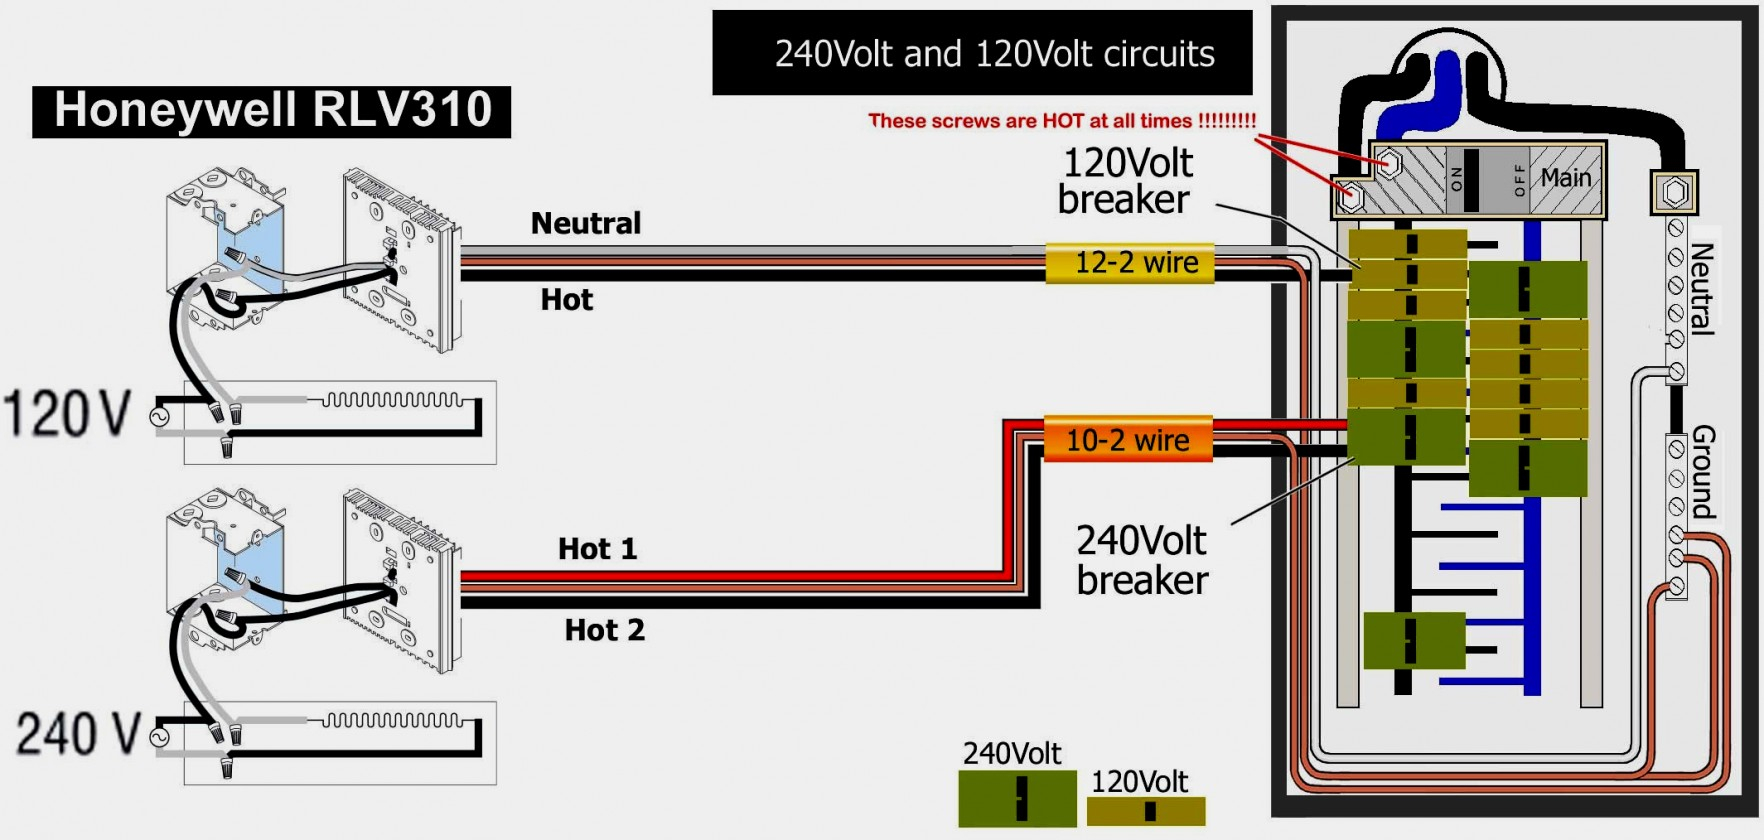 240 Volt Baseboard Heater Wiring Diagram